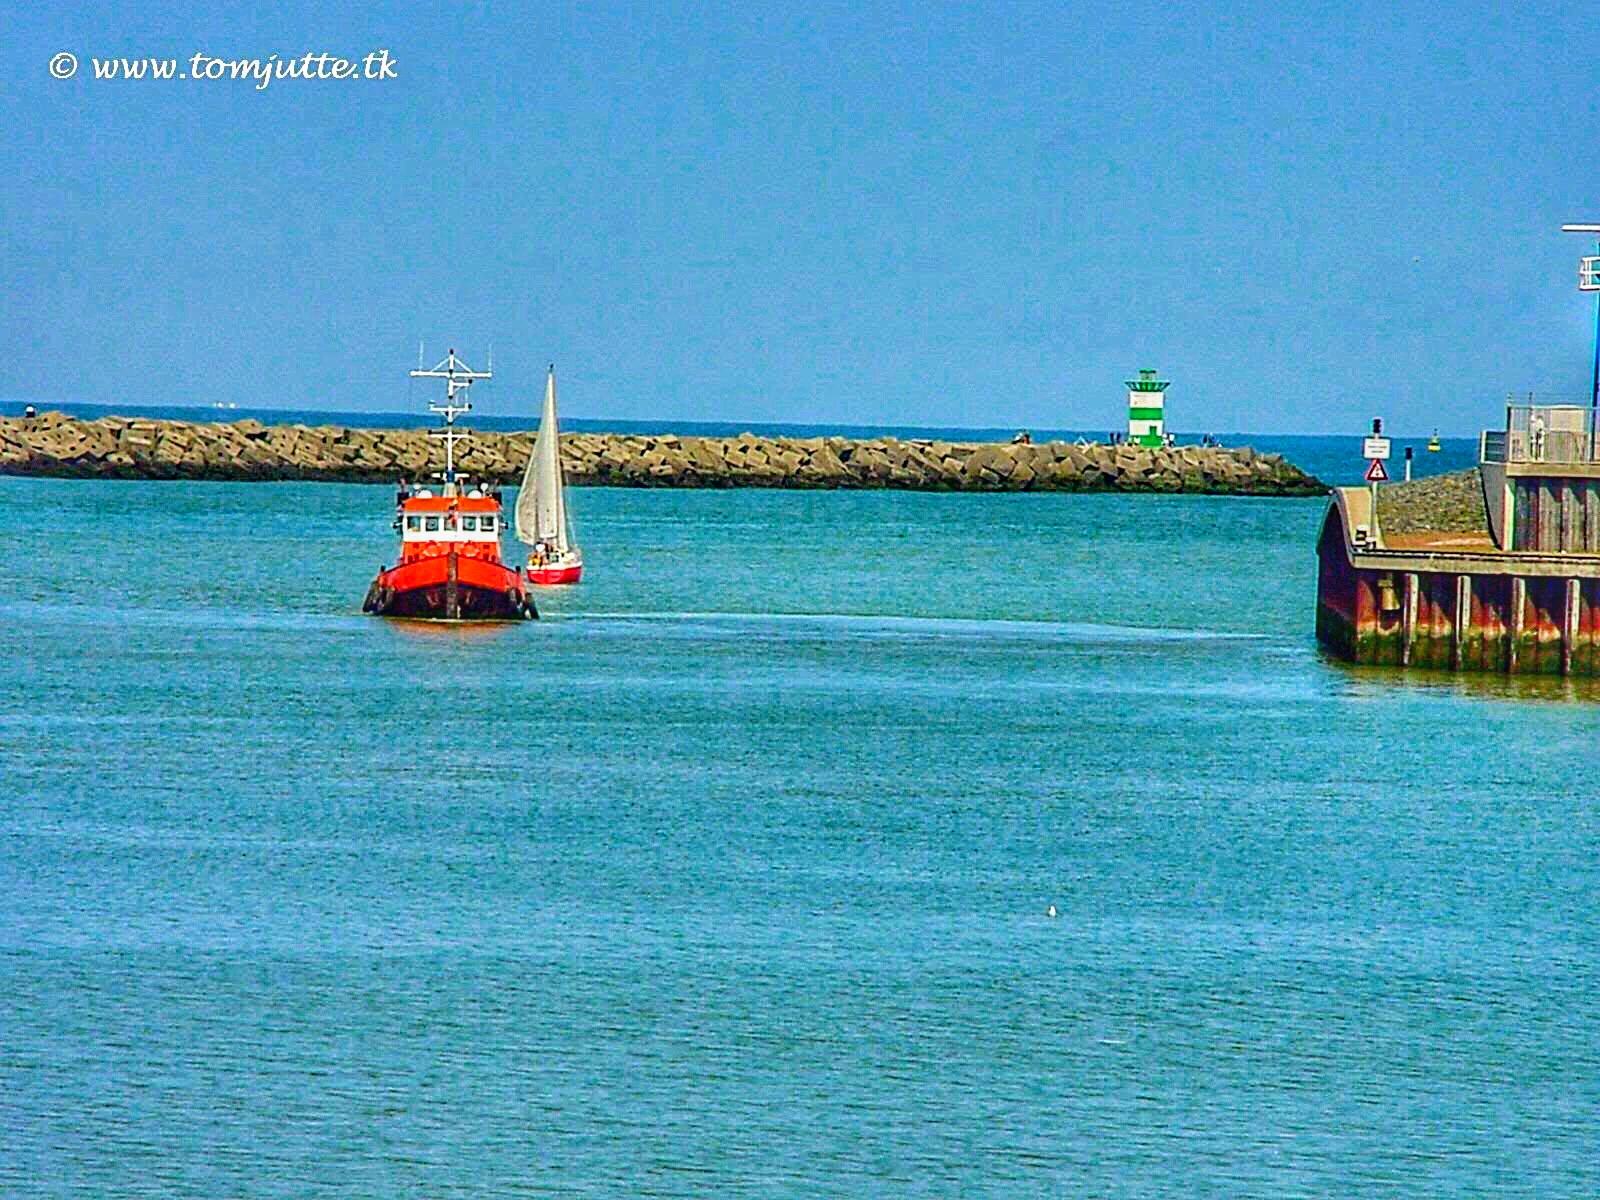 Hintergrundbilder : Schiff, Boot, Meer, Wasser, Natur, Himmel ...